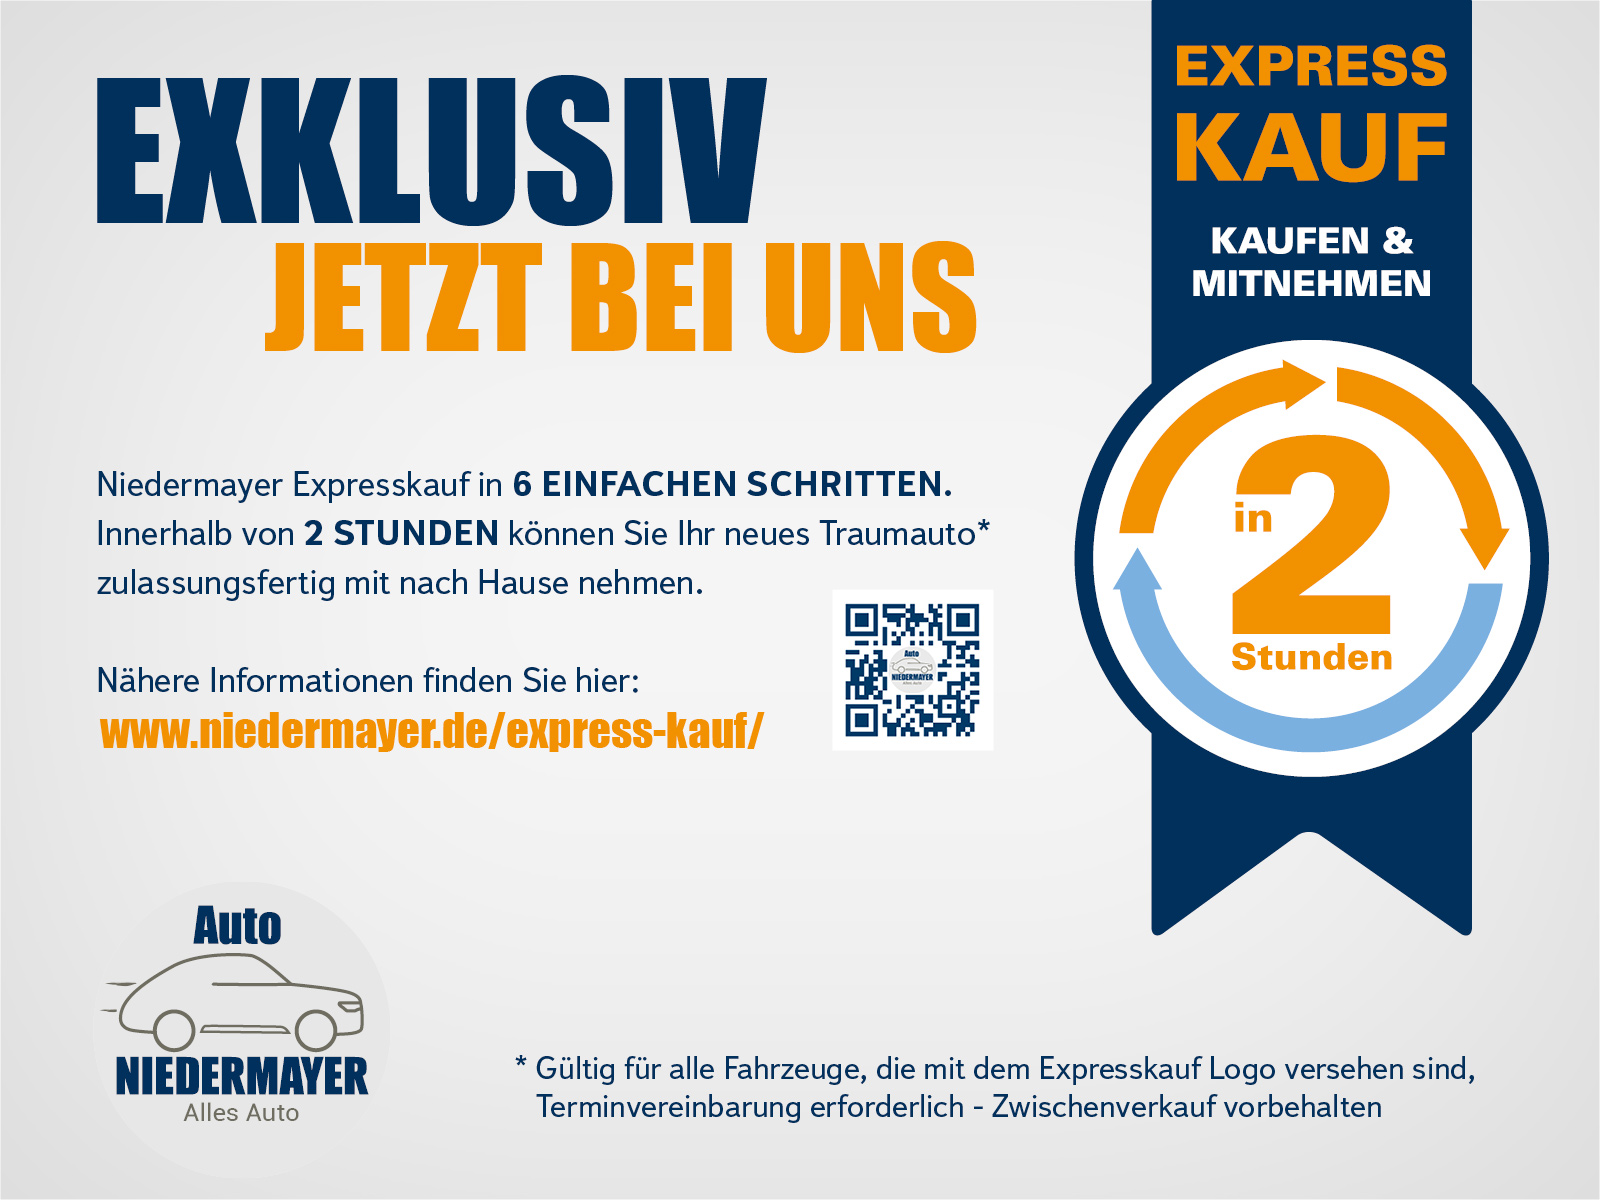 FORD KUGA 1.5 EcoBoost Cool & Connect, Navi, Winterpaket, Einparkhilfe, so Auto Niedermayer B2B, D-94362 Neukirchen